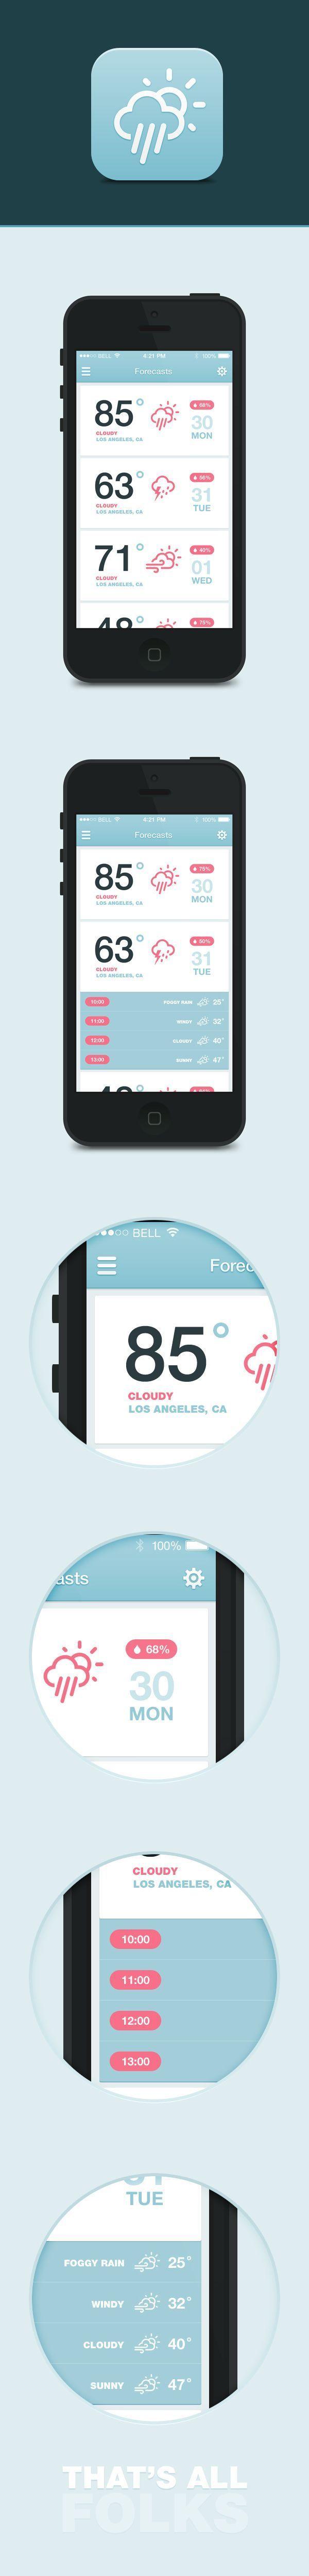 Inspiration Mobile #19 : Applications météo | Blog du Webdesign